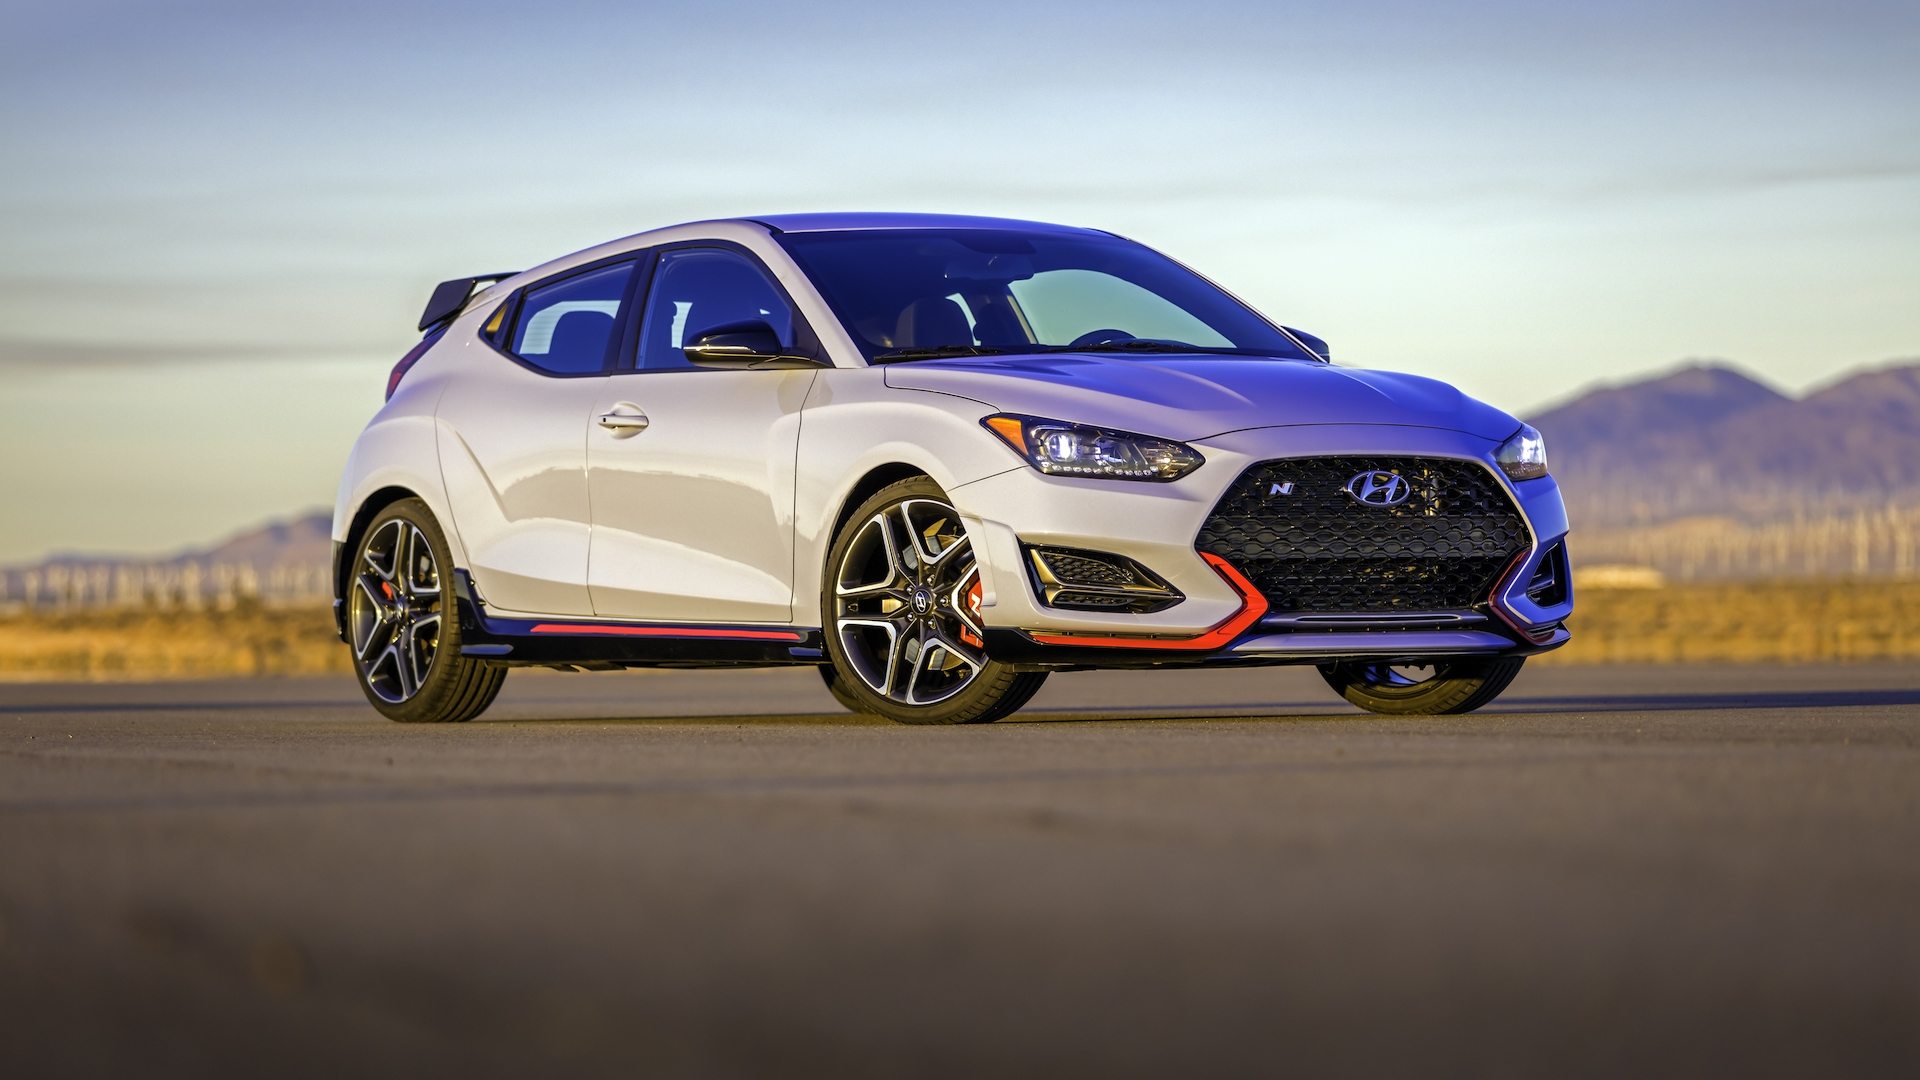 Hyundai Veloster N 2020 en el atardecer